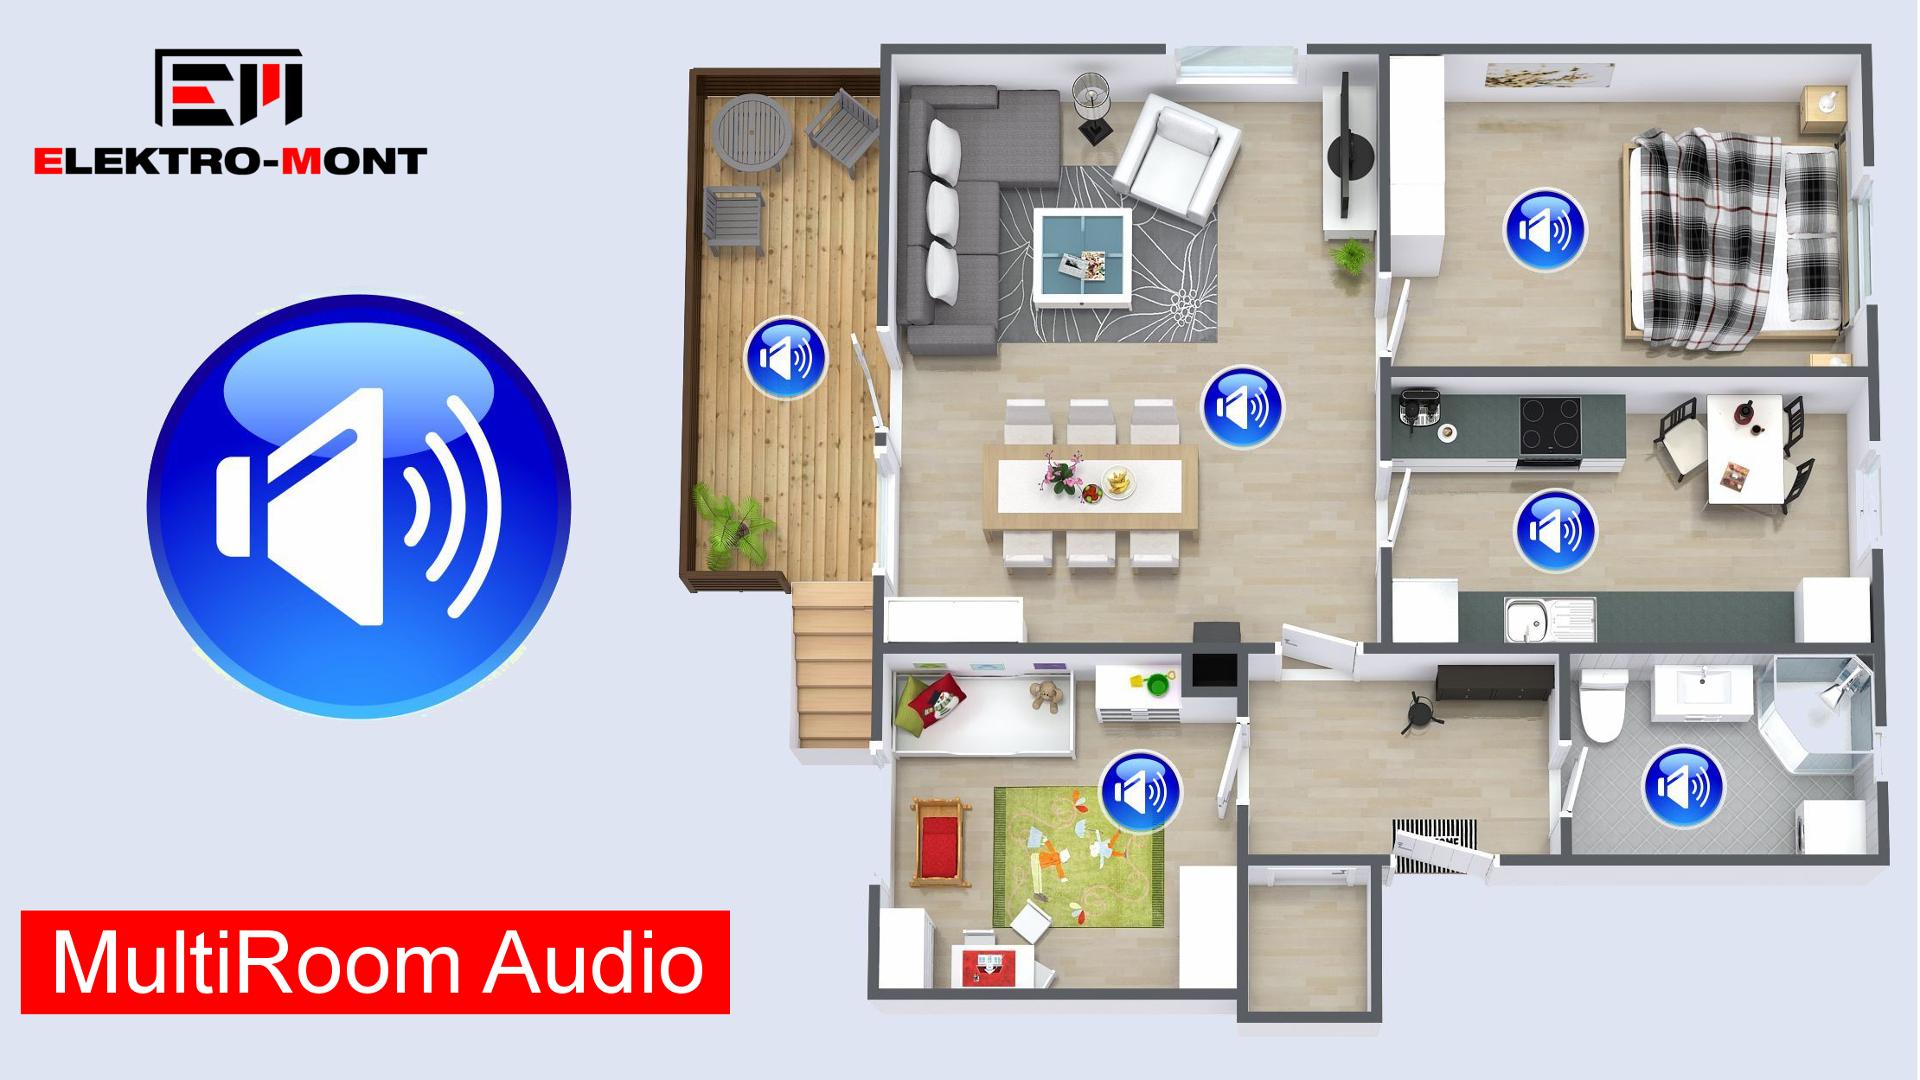 elektro mont instalacje i systemy elektryczne zabrze. Black Bedroom Furniture Sets. Home Design Ideas